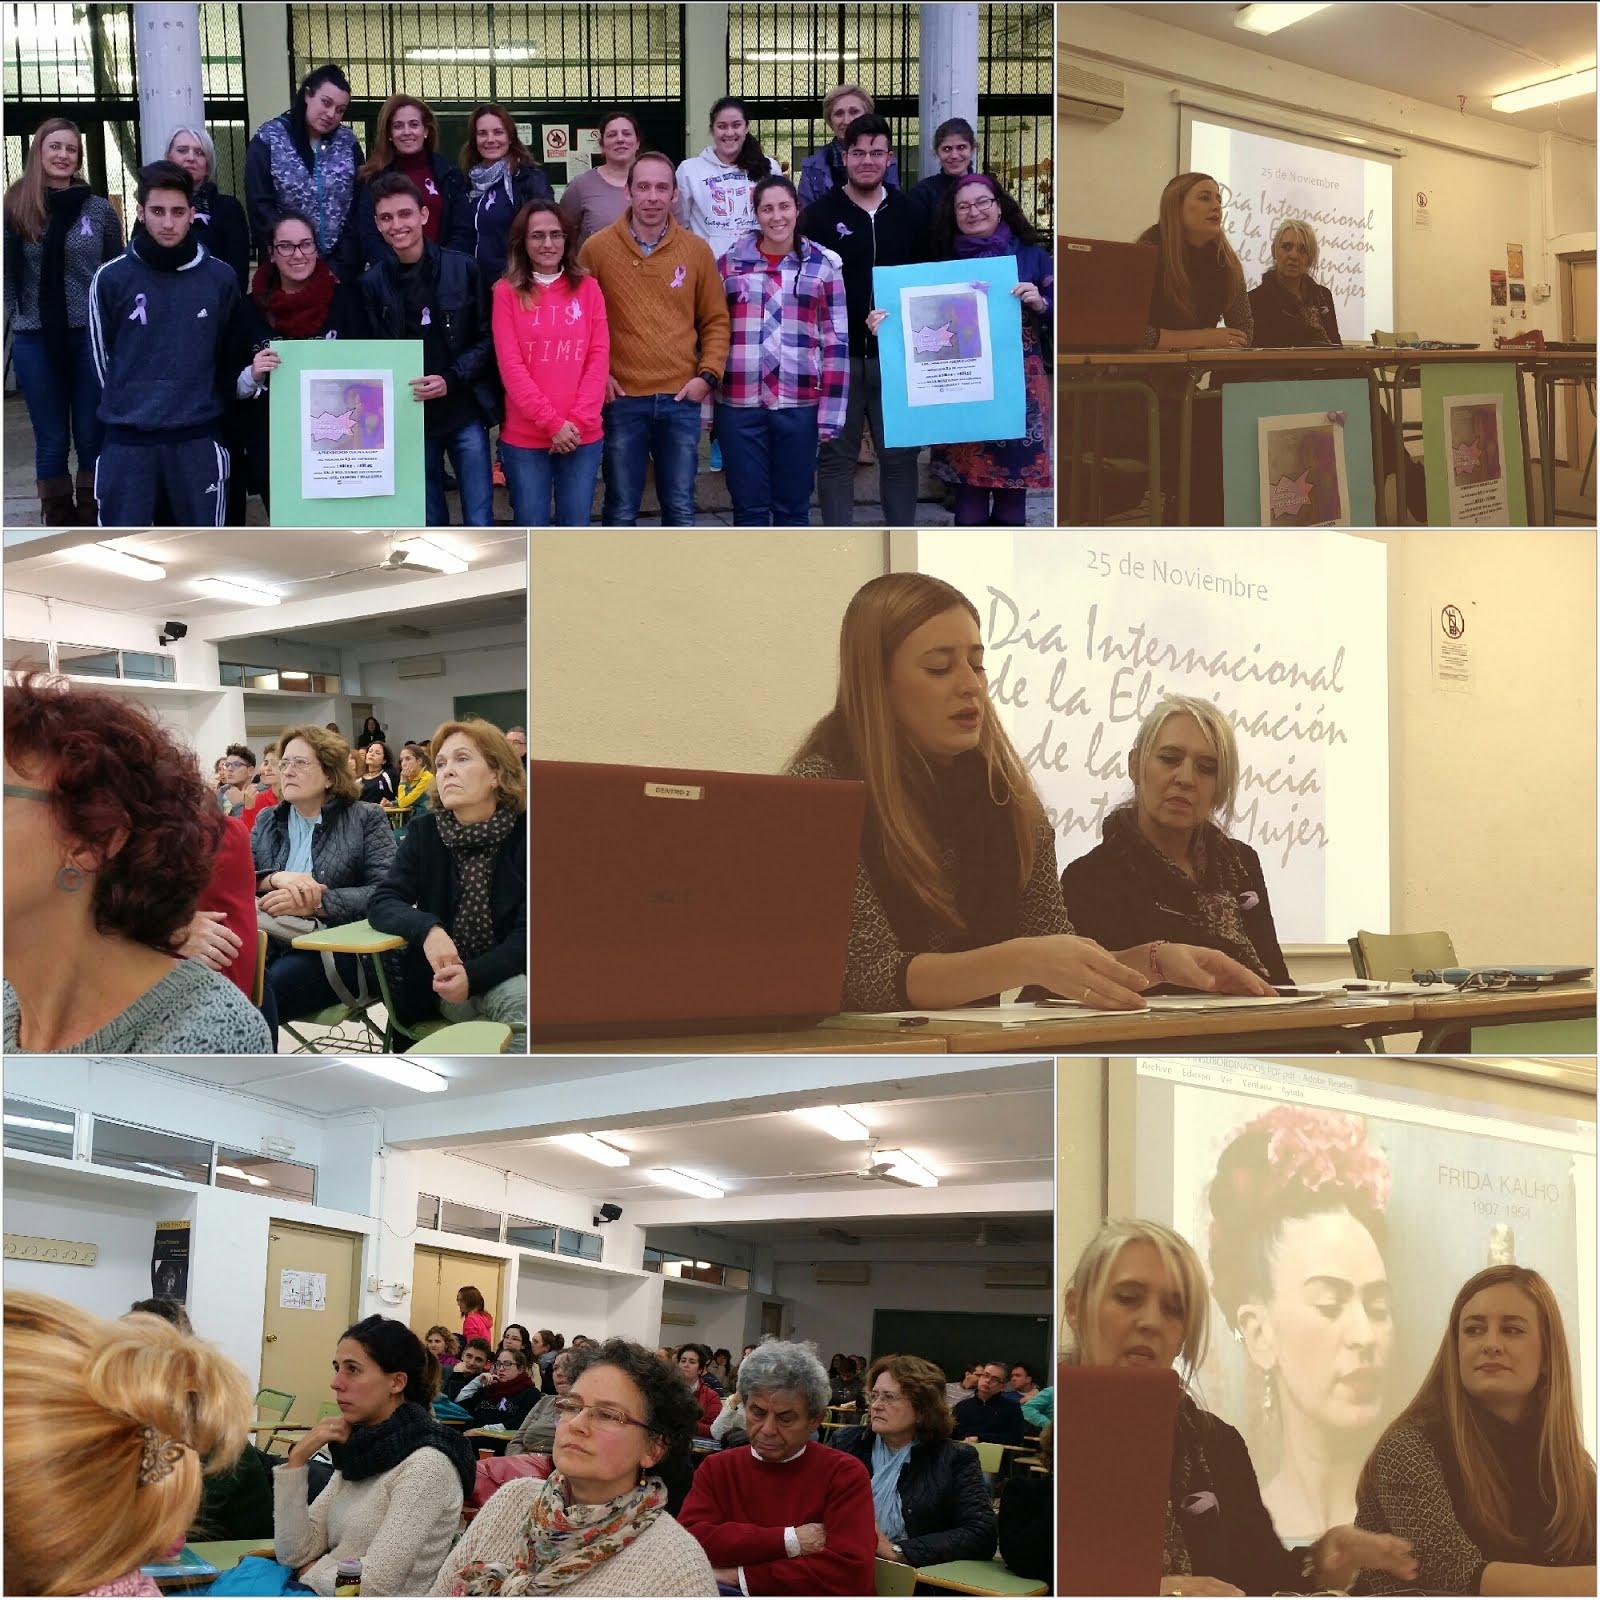 Presentazione a cura di Lucía Cabrera e Pilar López